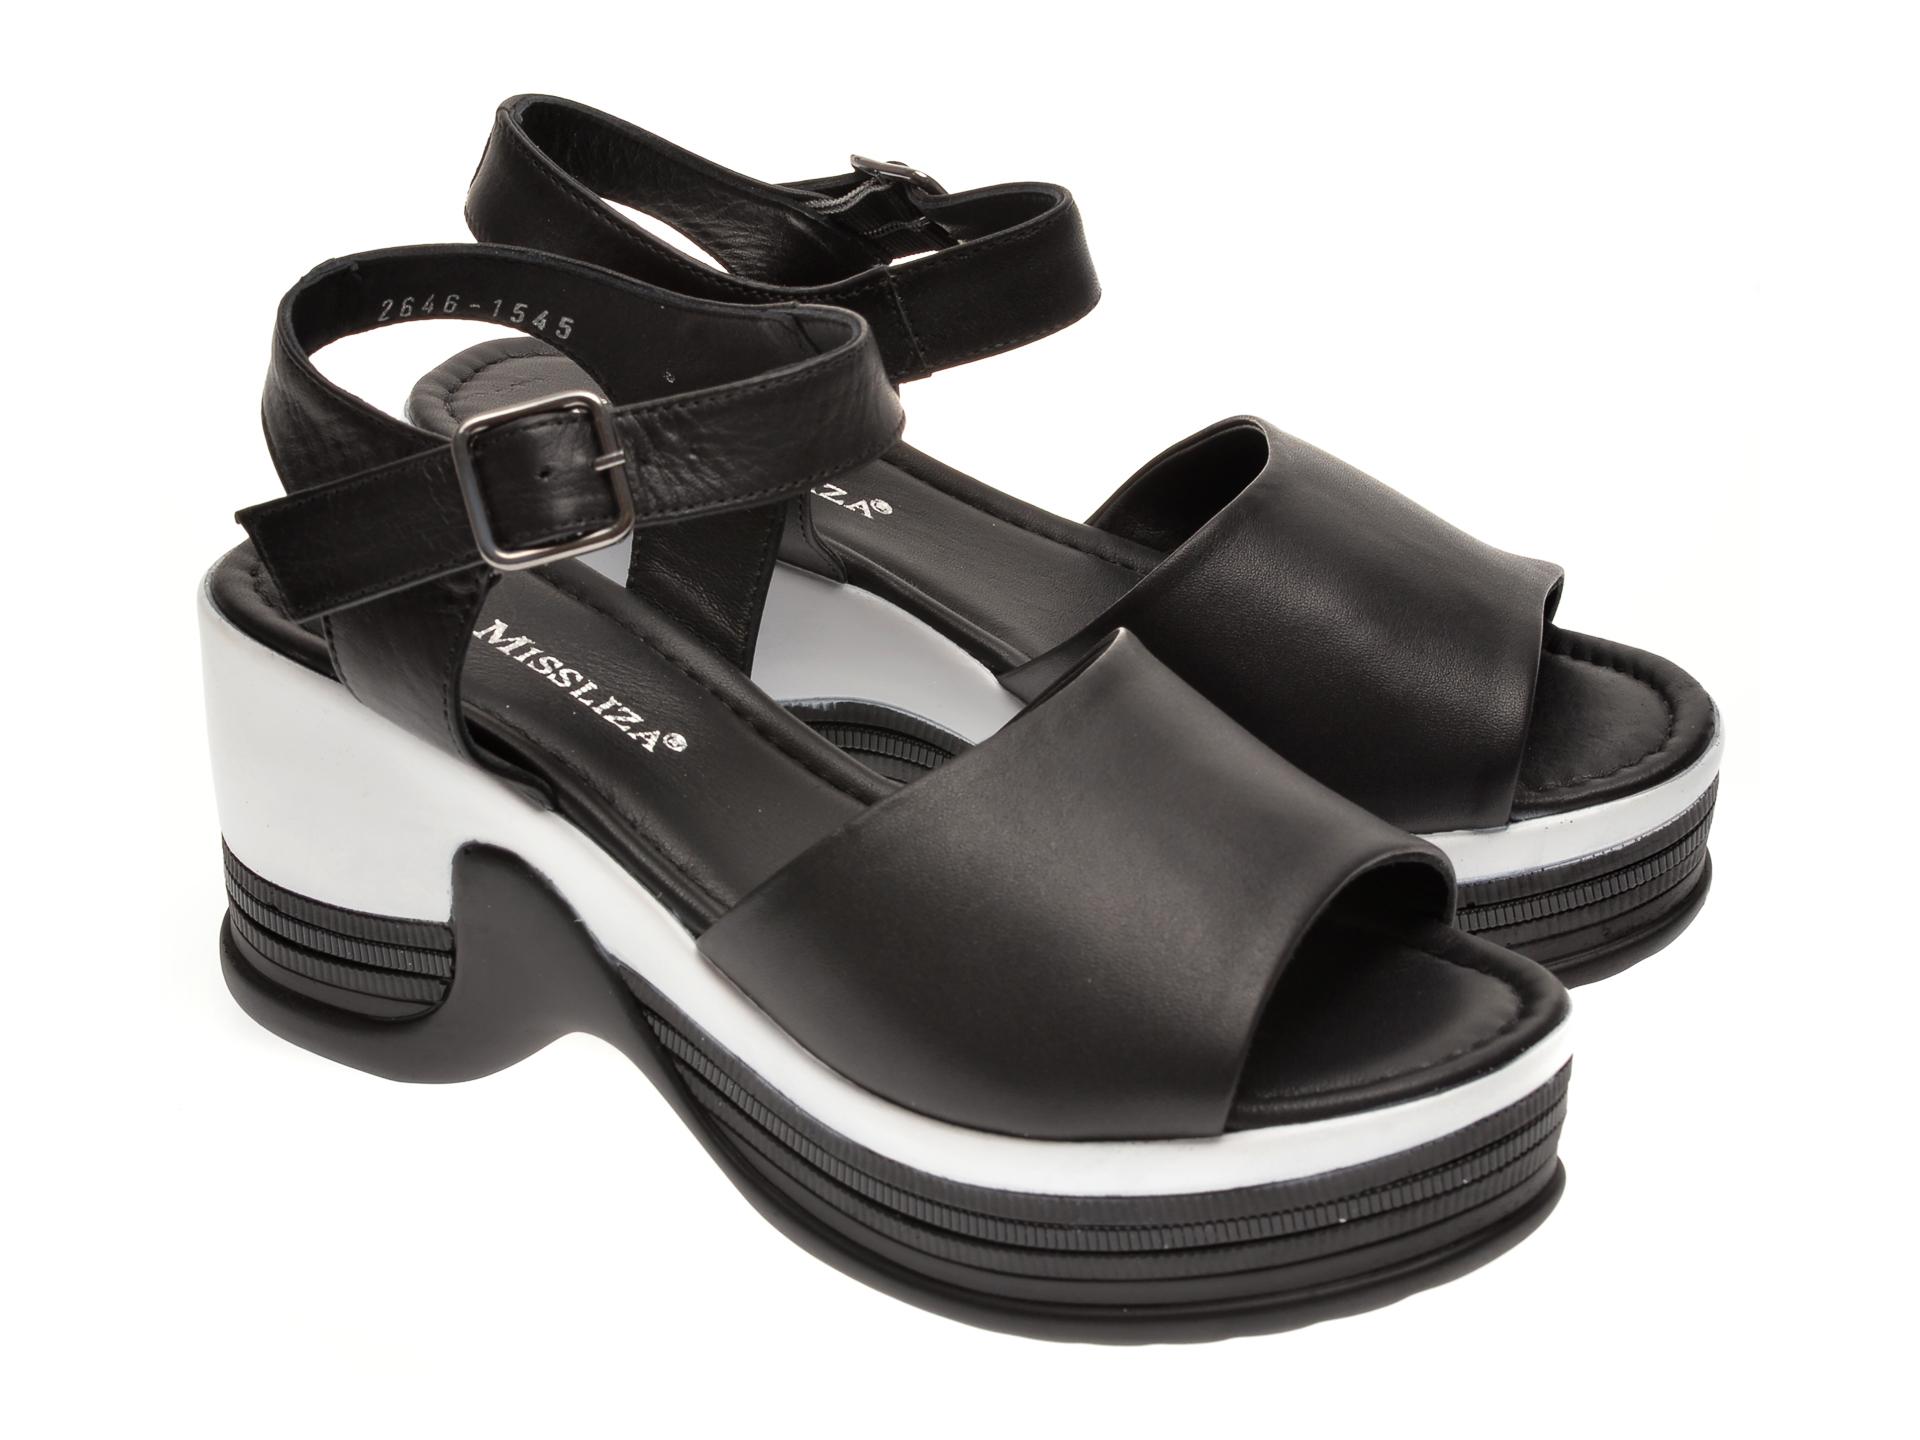 Sandale MISS LIZA negre, 1182546, din piele naturala